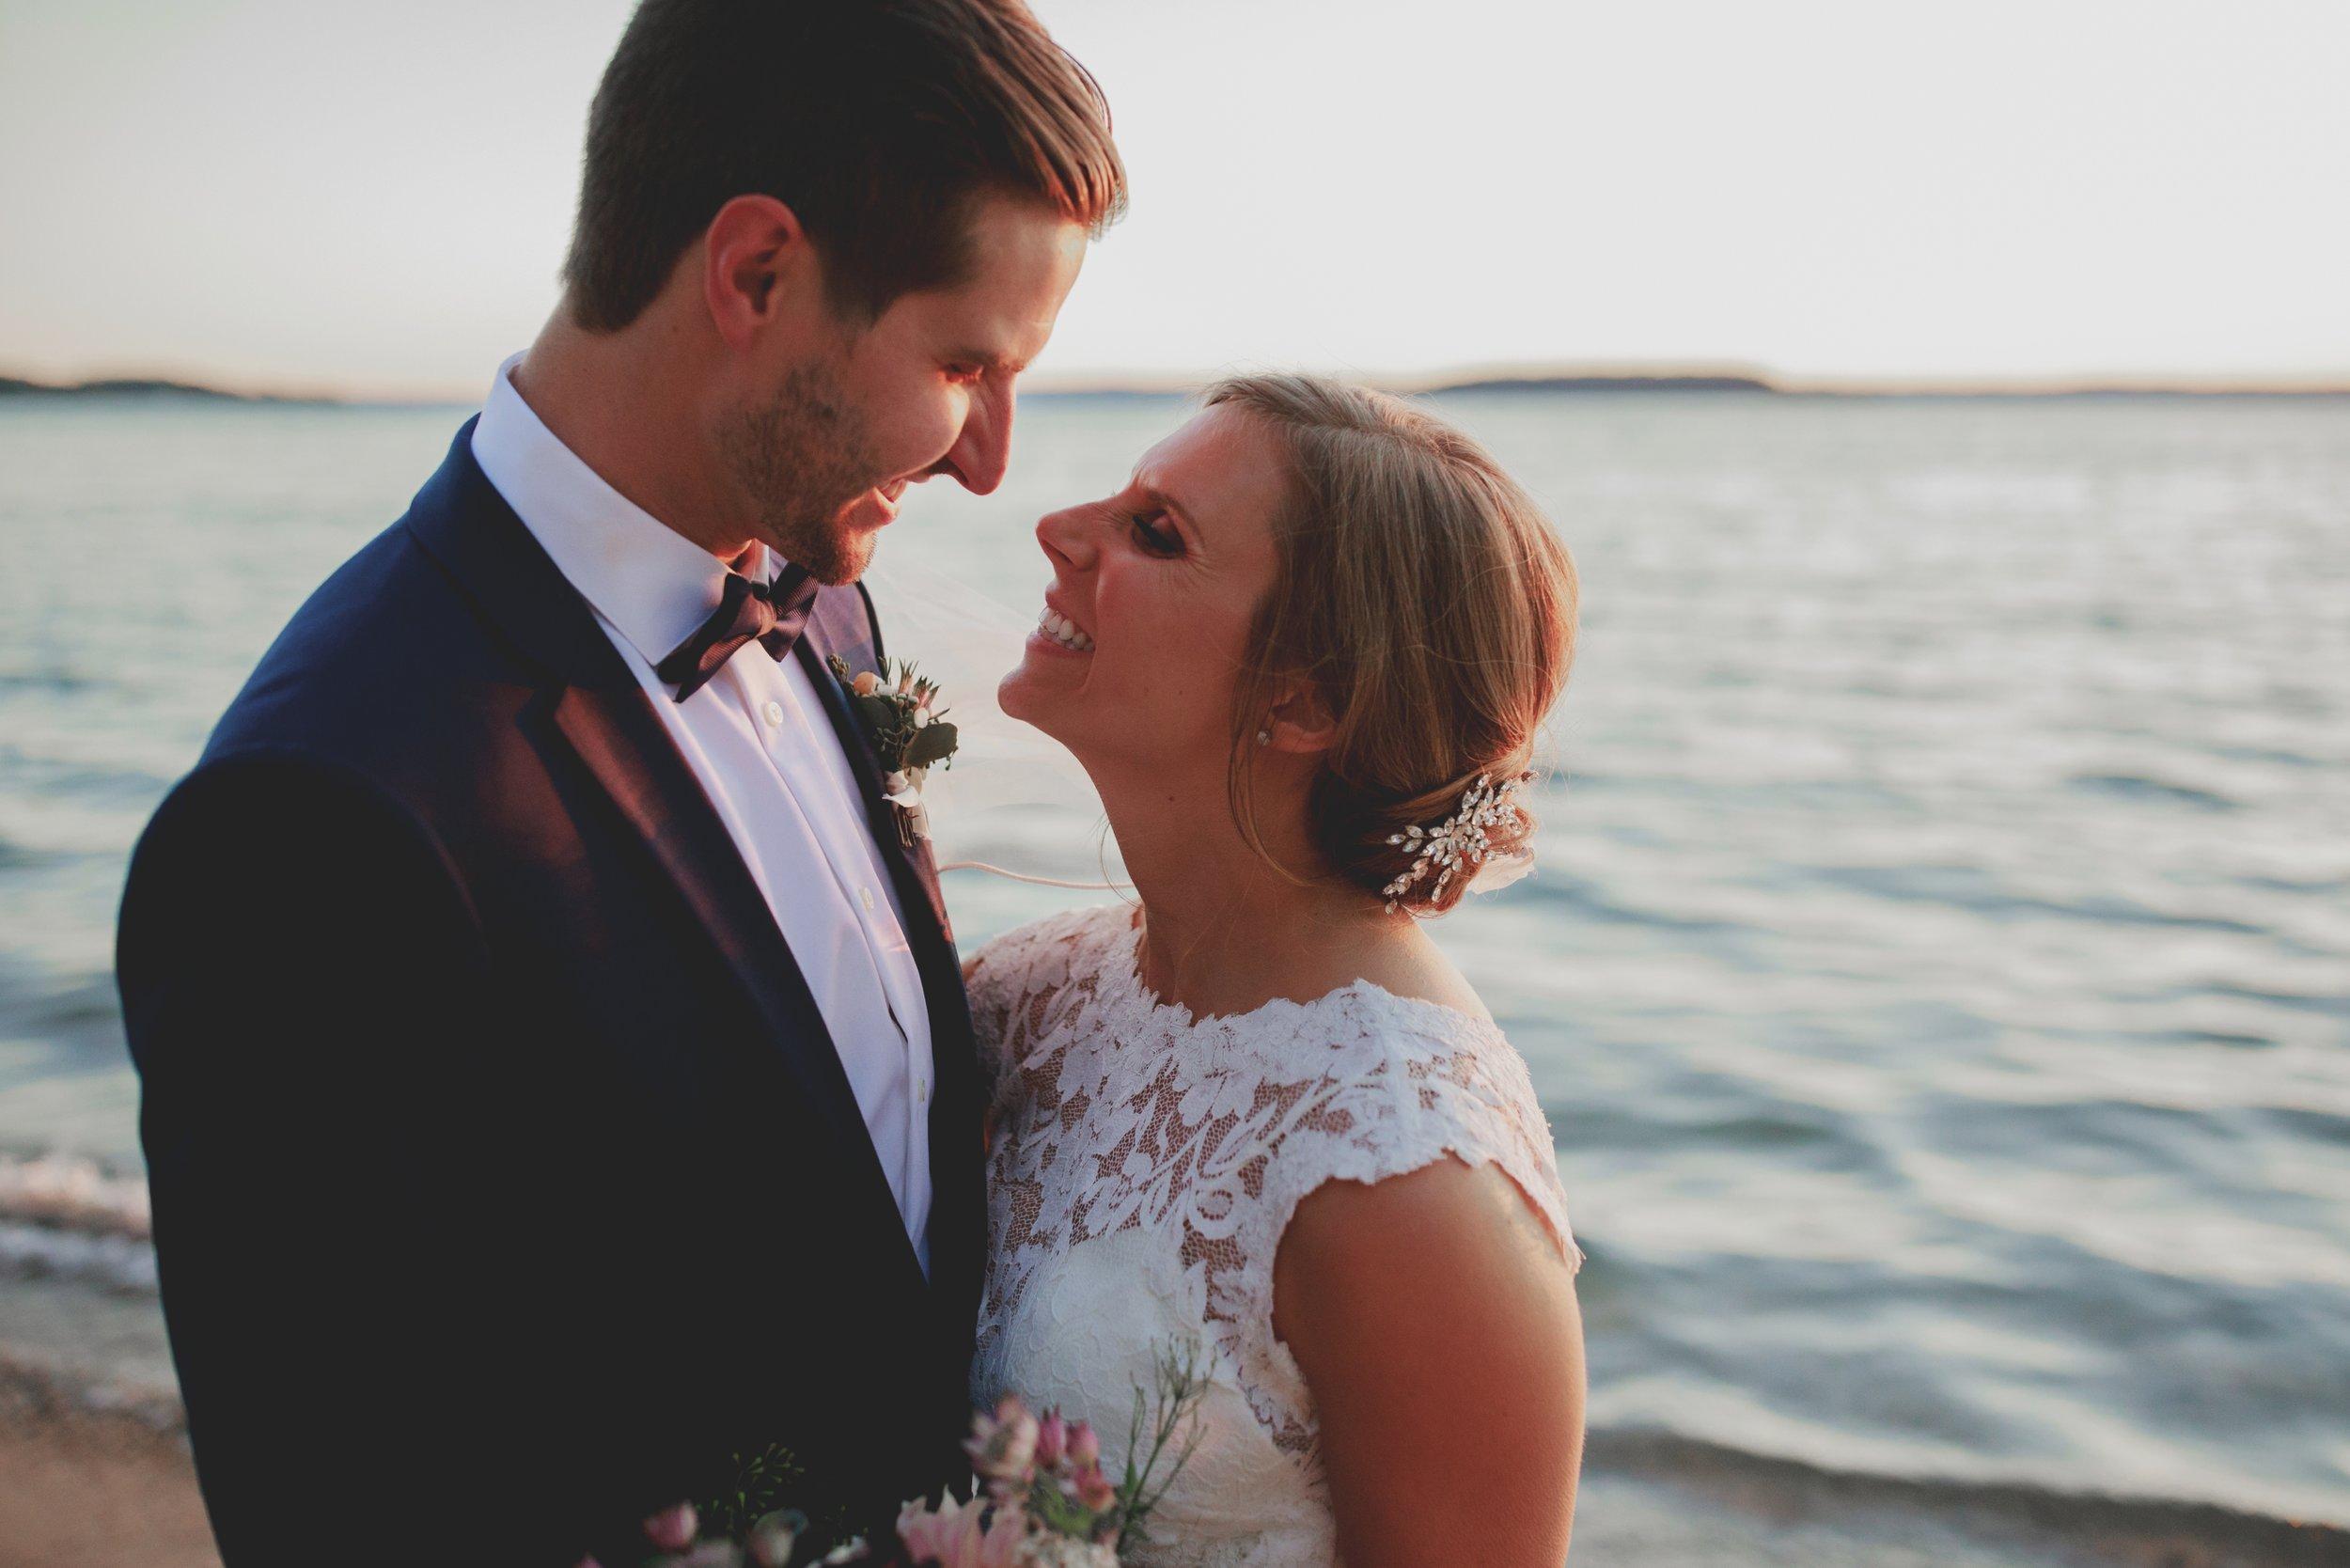 traverse_city_wedding_123.jpg